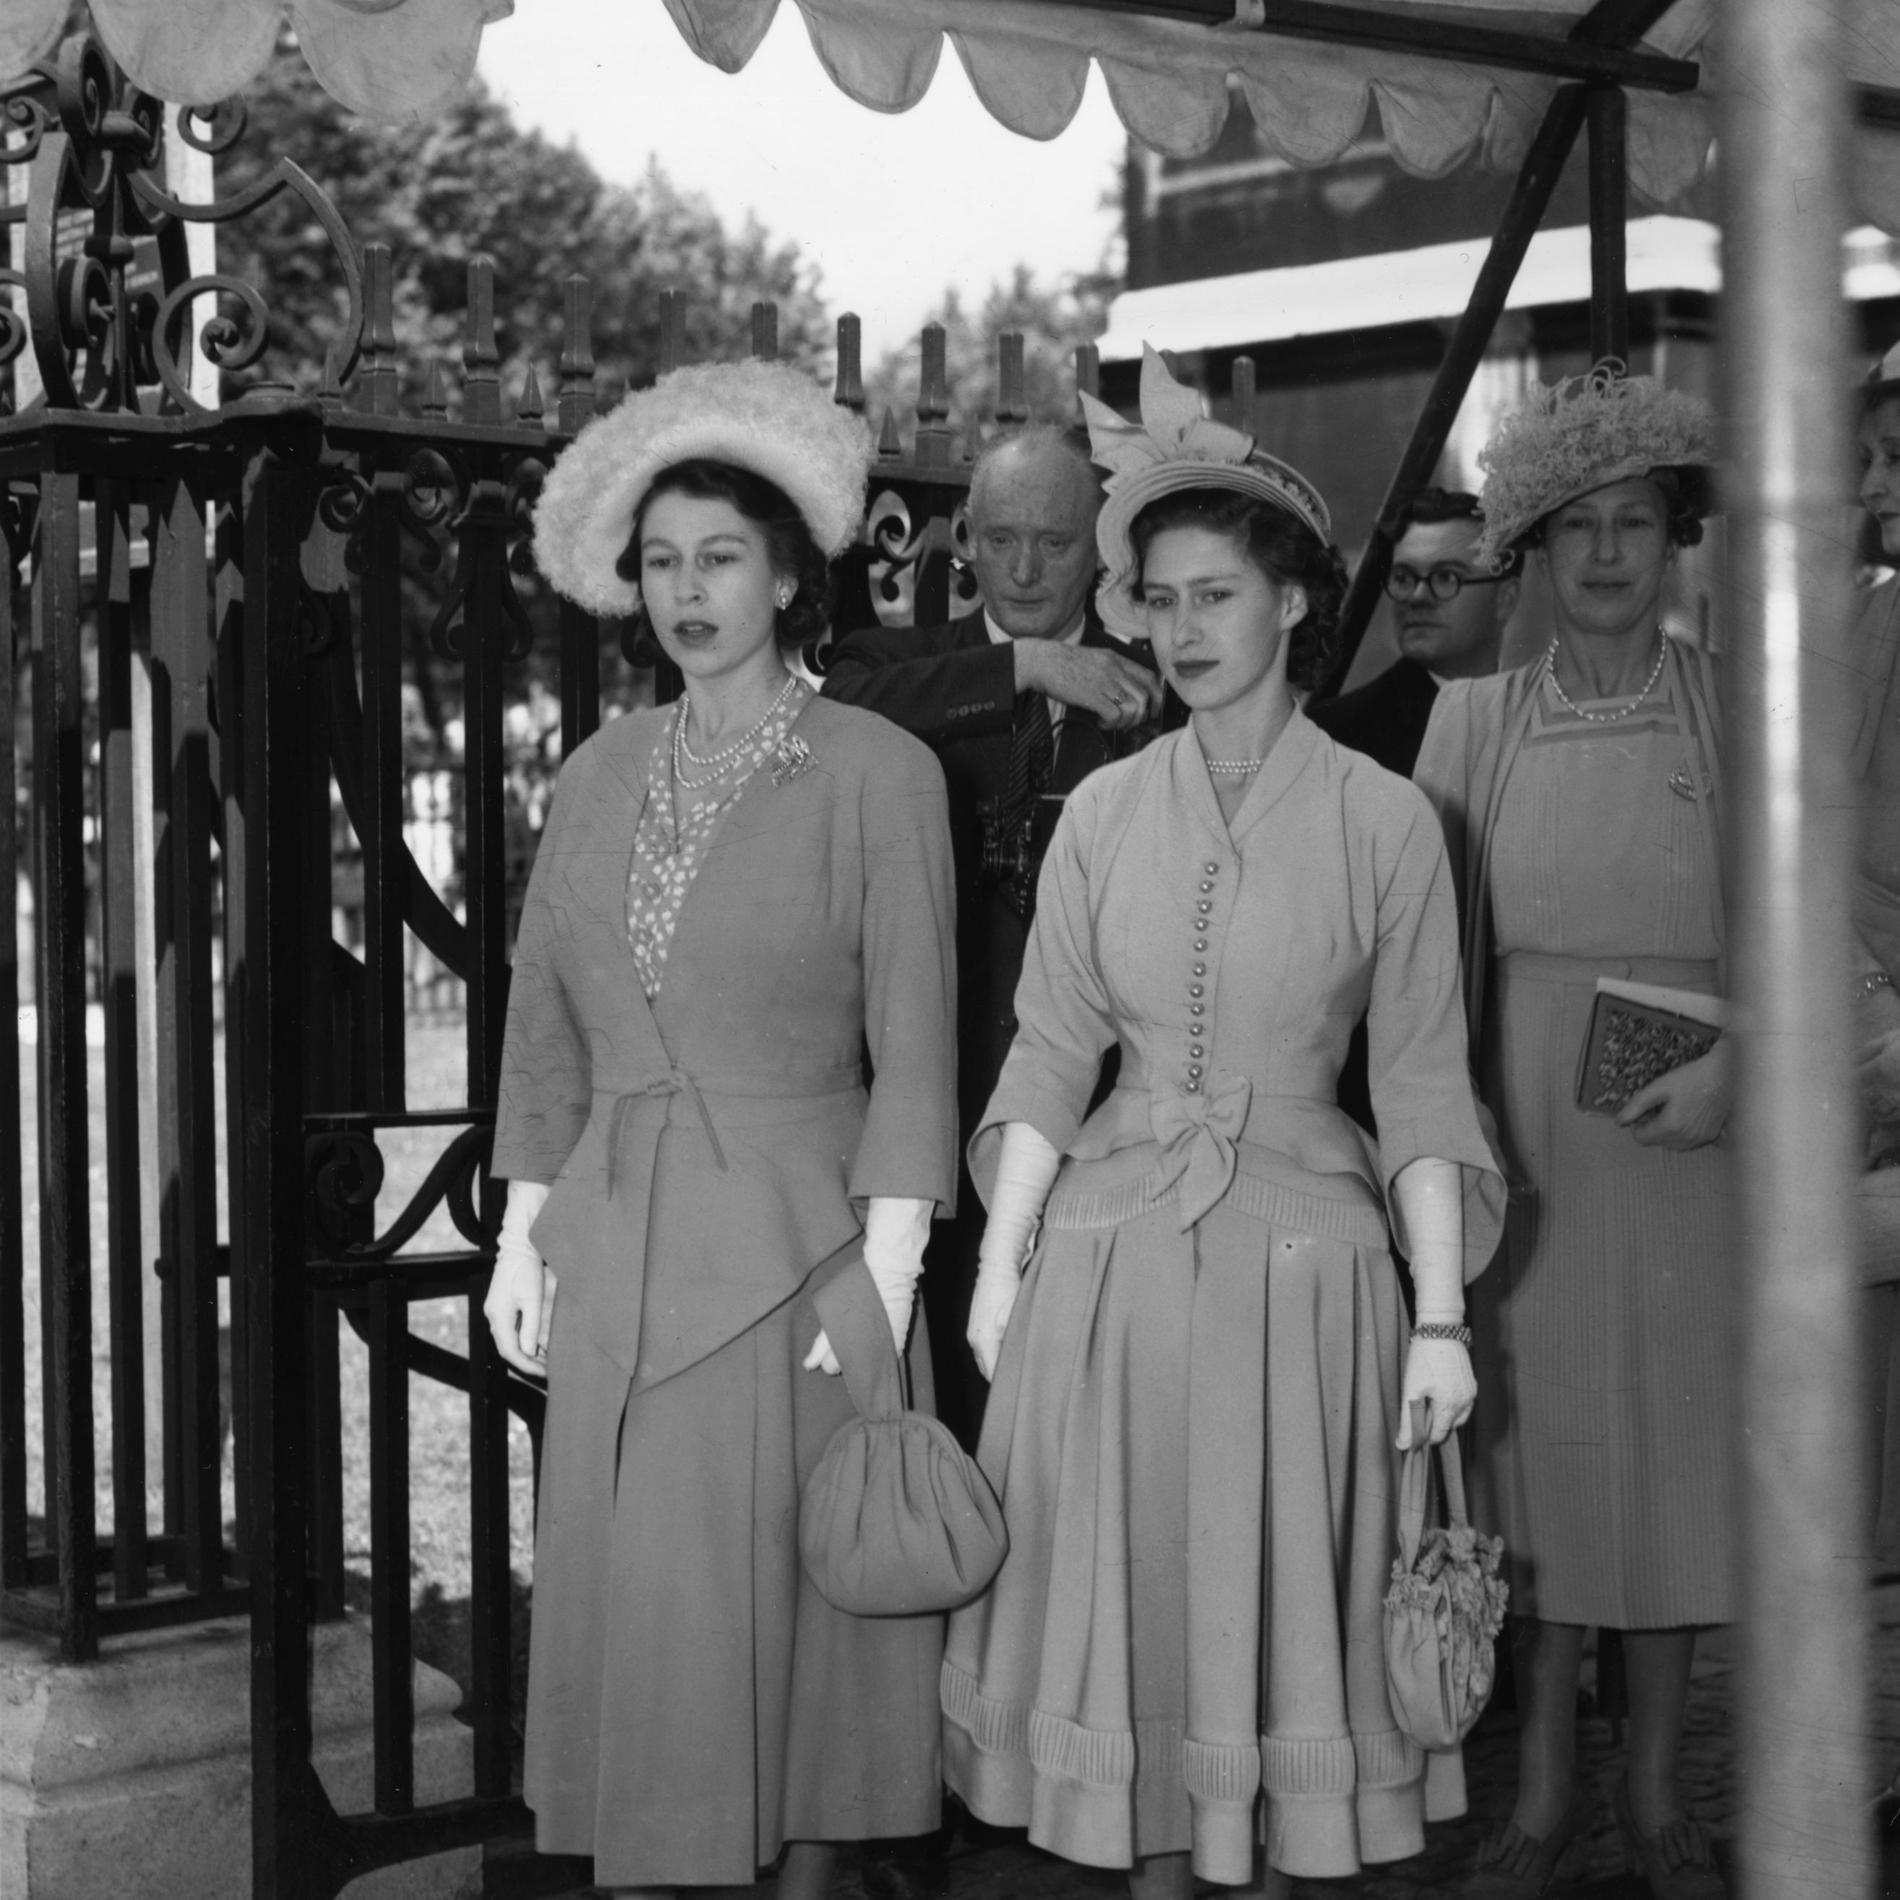 Les tenues de mariage de la reine d'Angleterre Elizabeth II - 1948